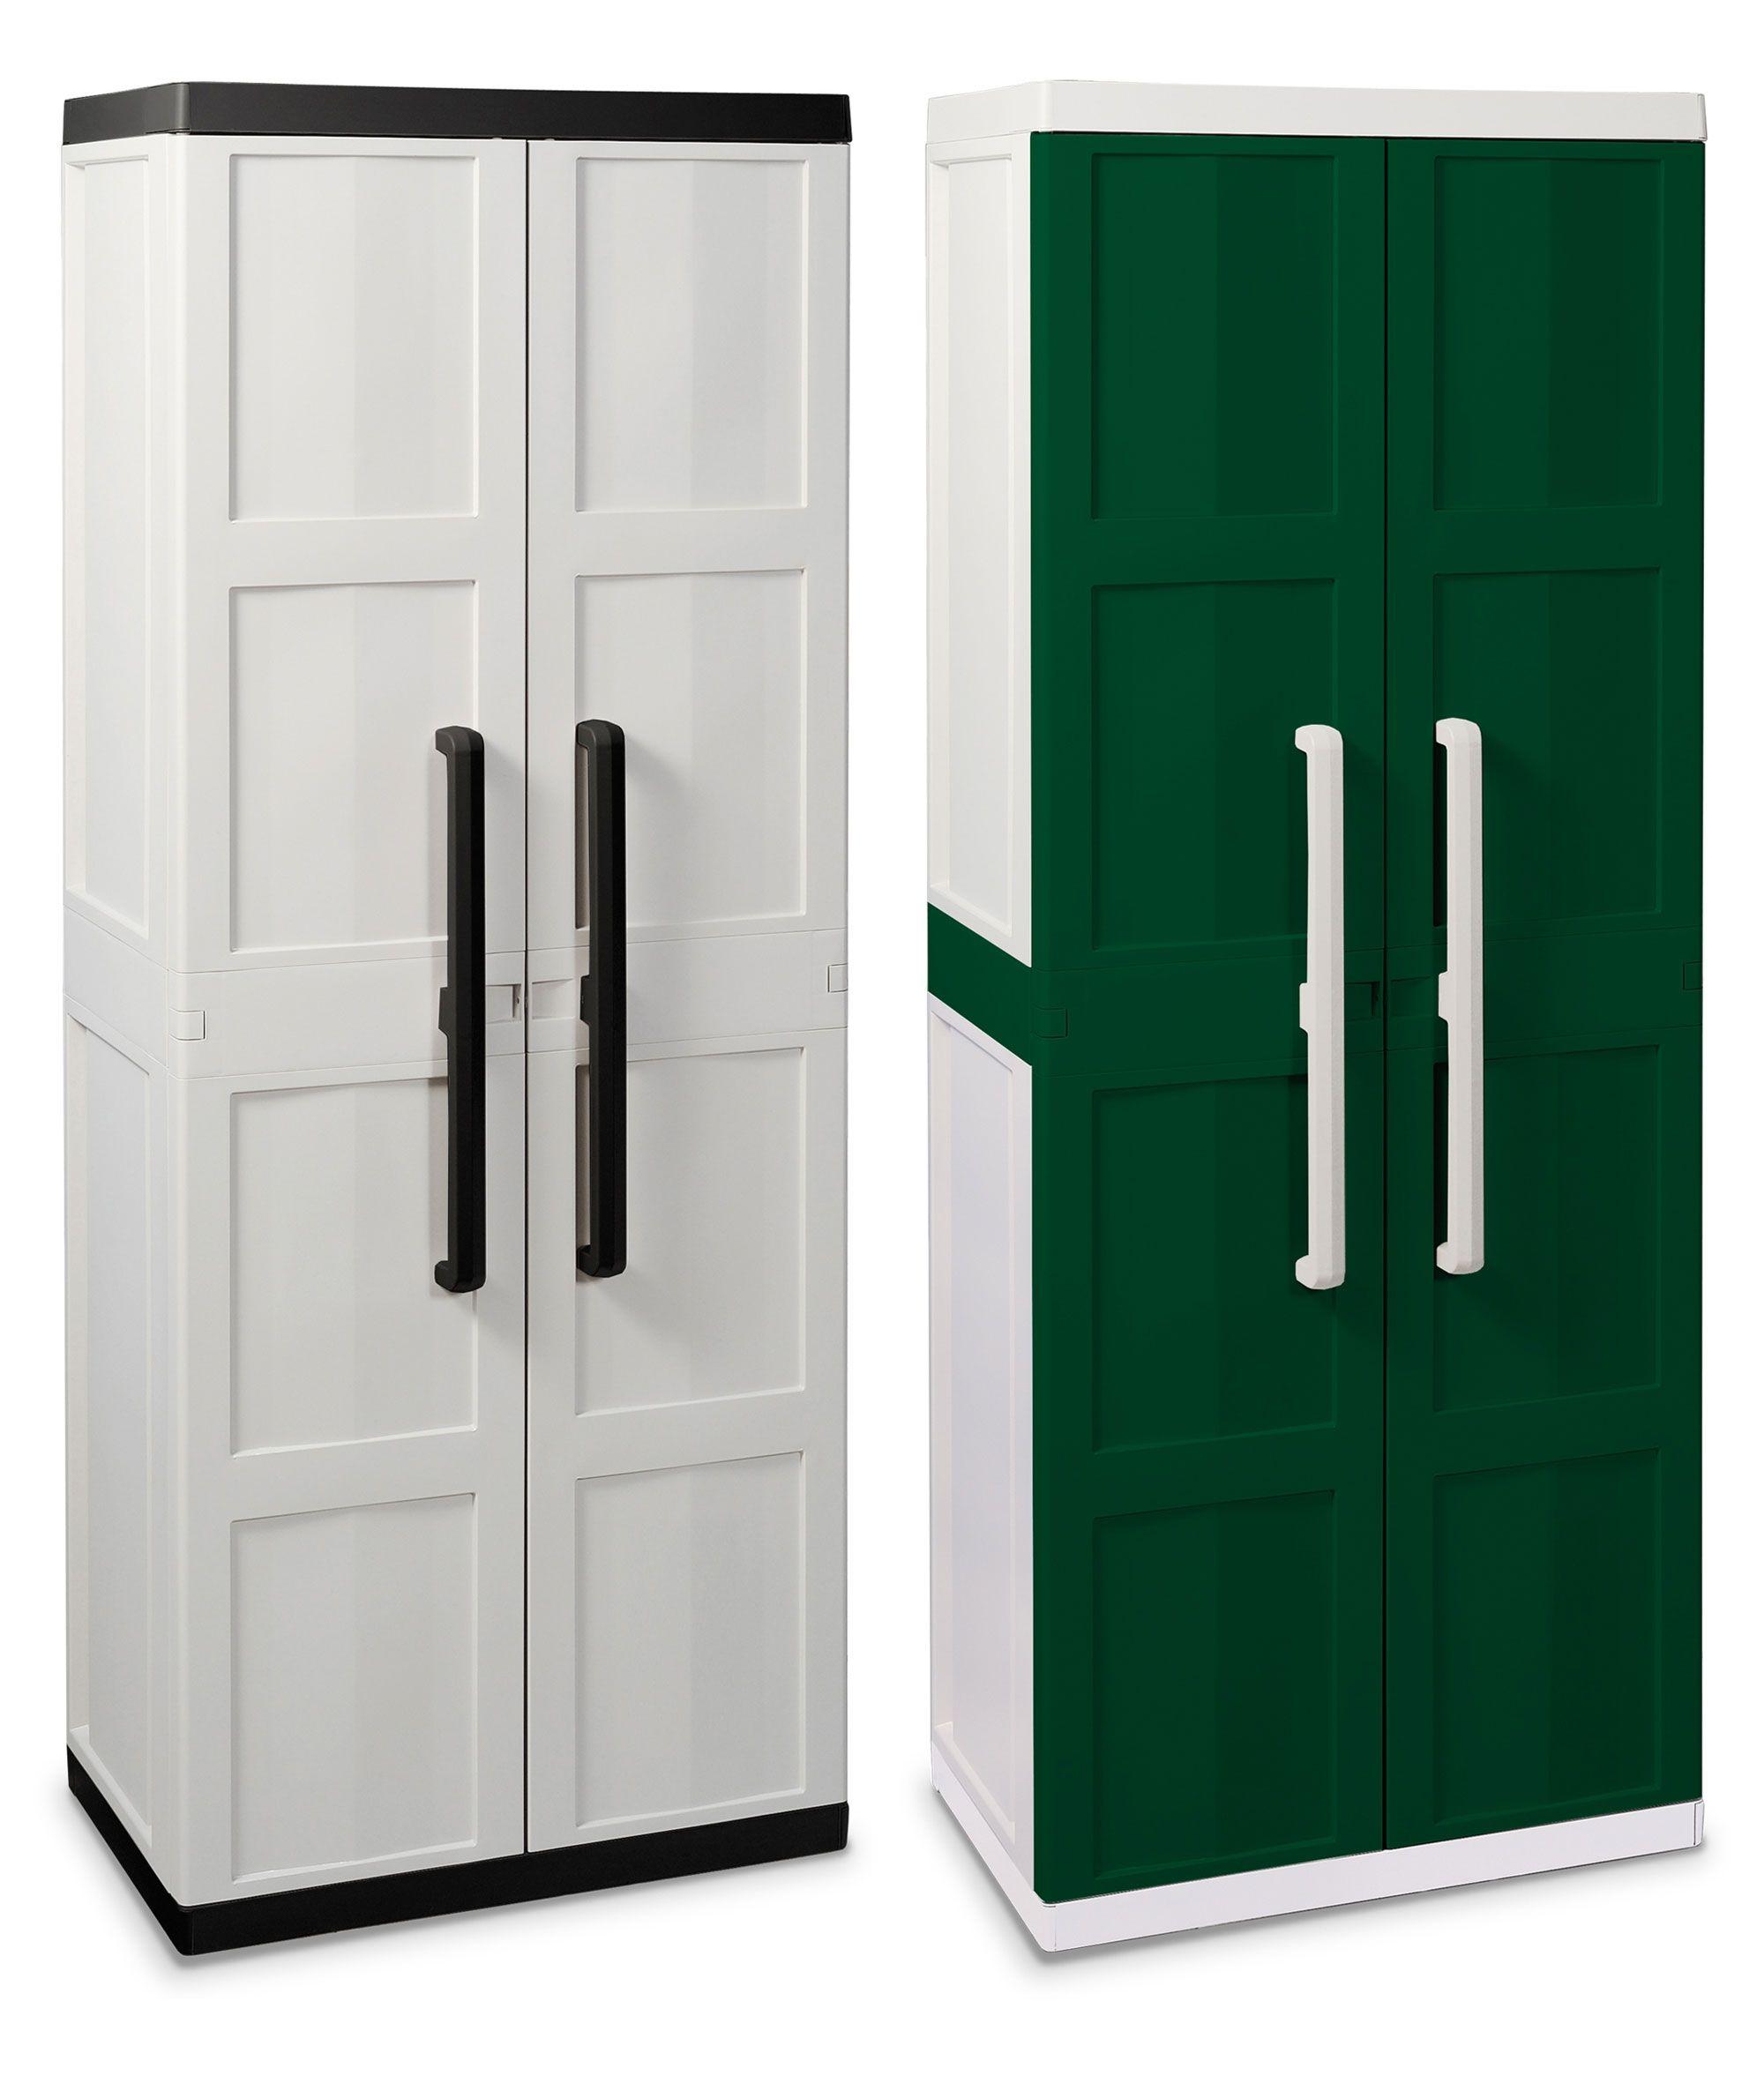 Plastic Storage Cabinet With Doors Httpdivulgamaisweb